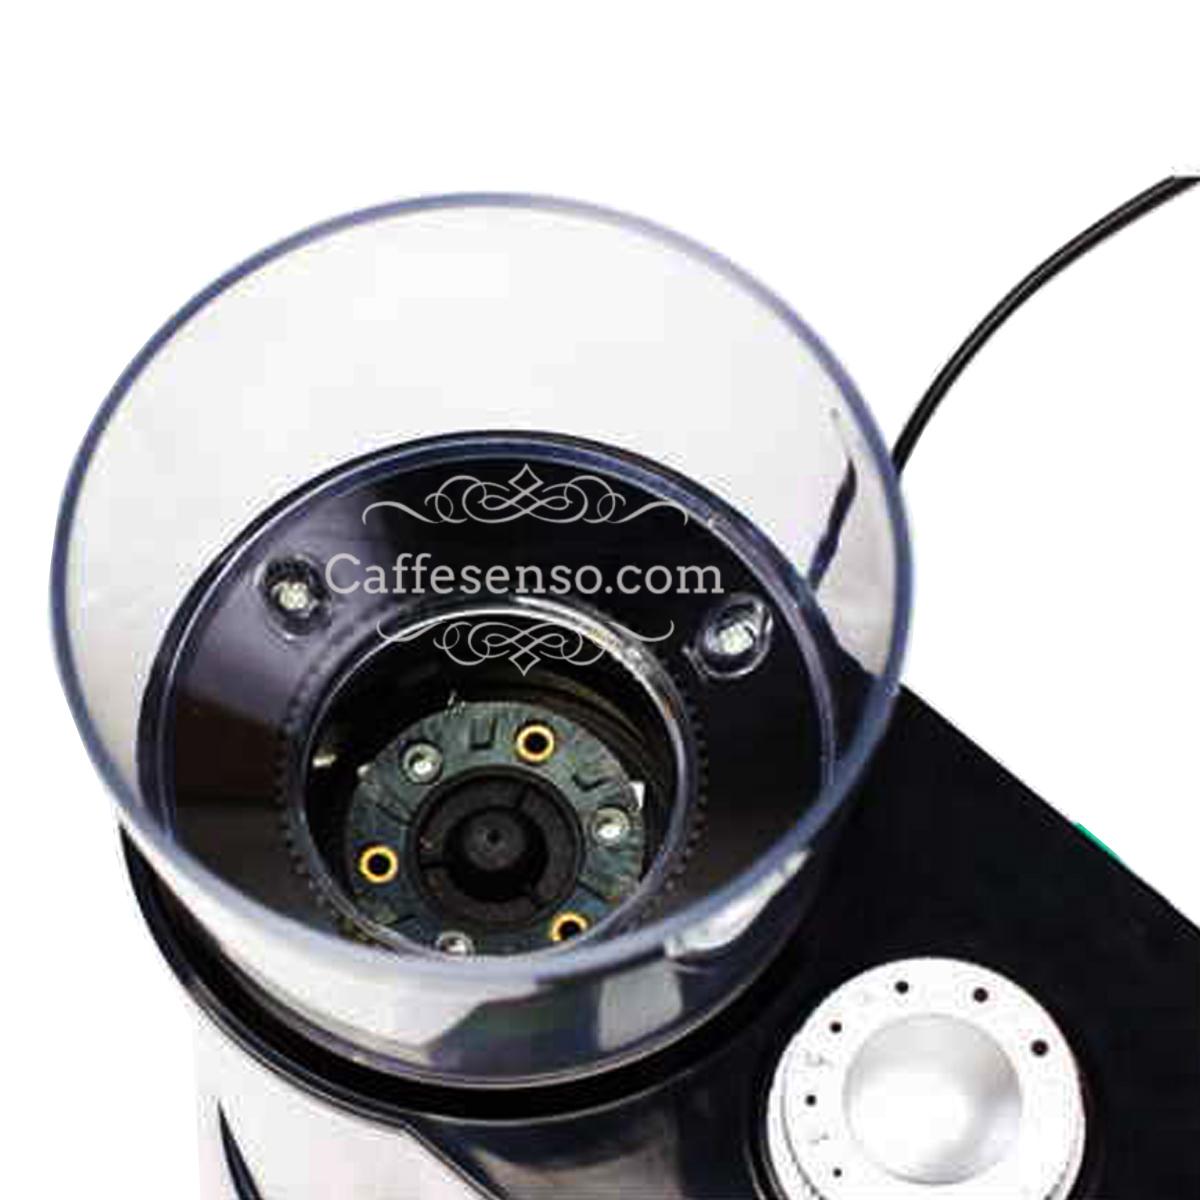 آسیاب قهوه خانگی مدل fk-85d